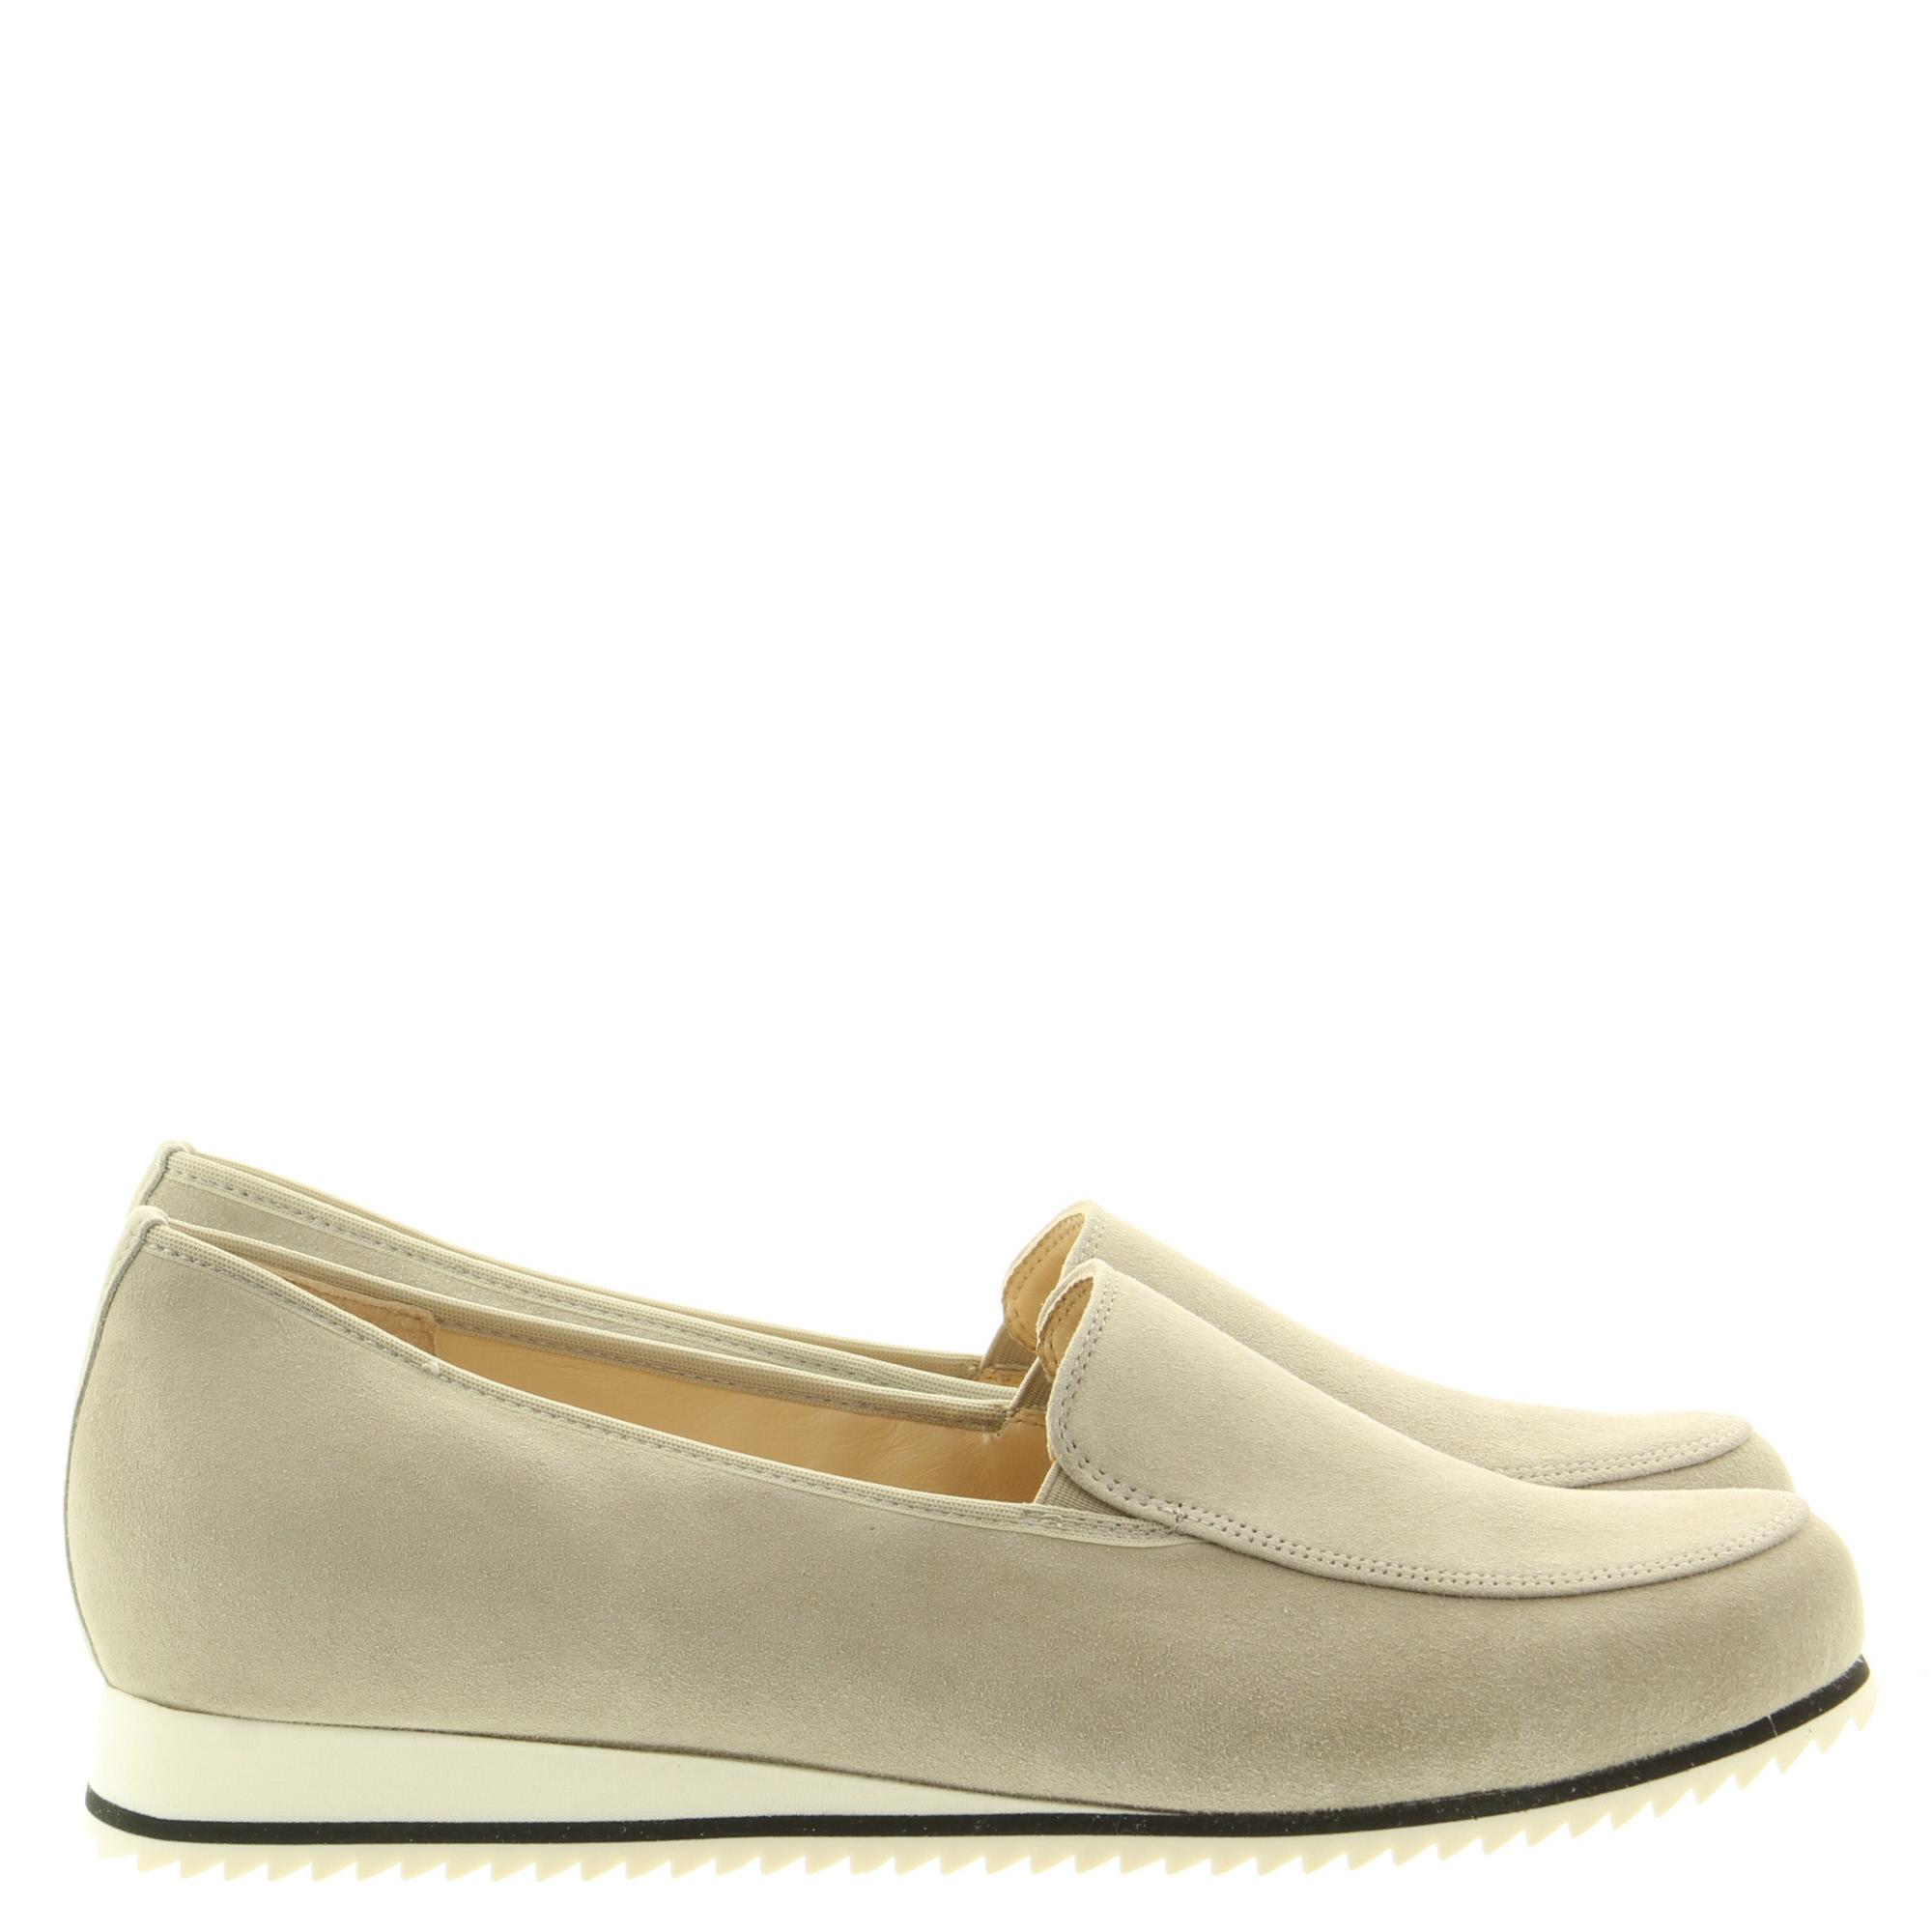 Hassia Shoes 301642 Piacenza 6500 Dune